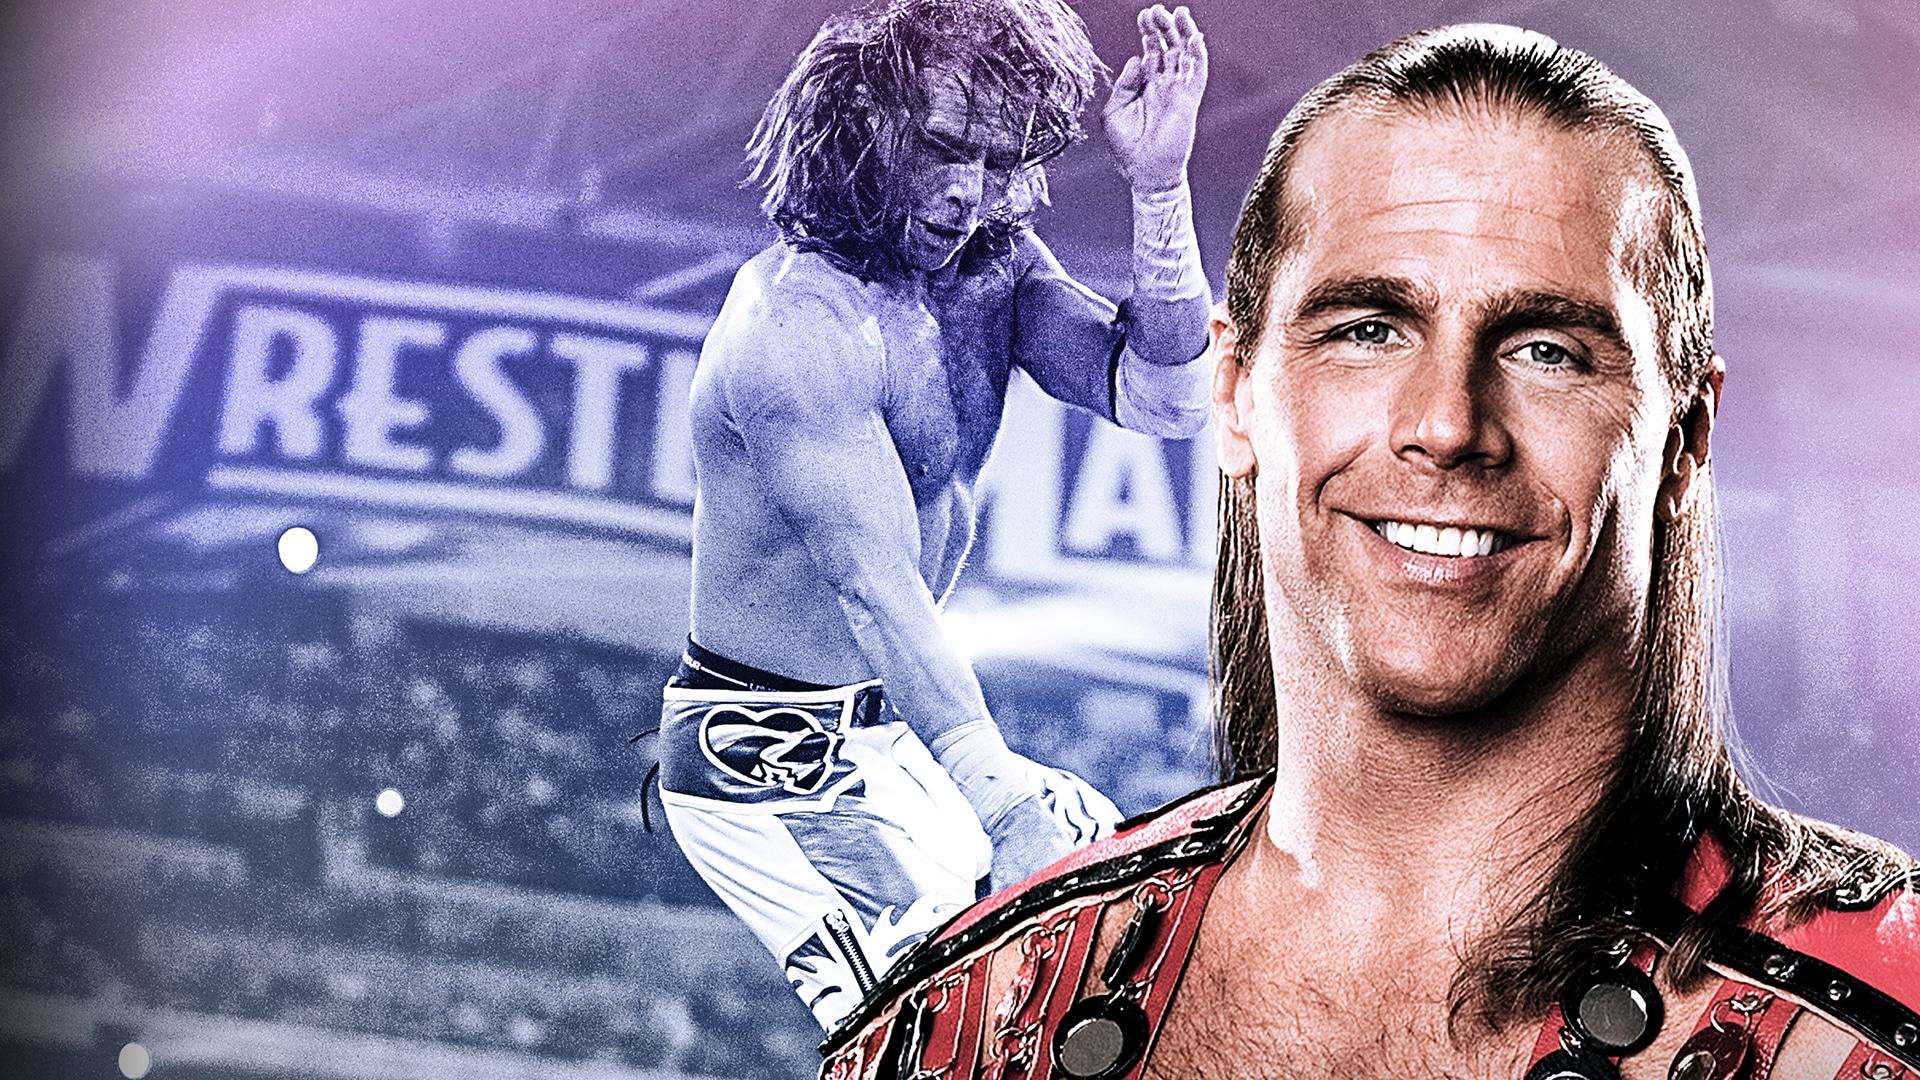 Shawn Michaels' Best WrestleMania Matches